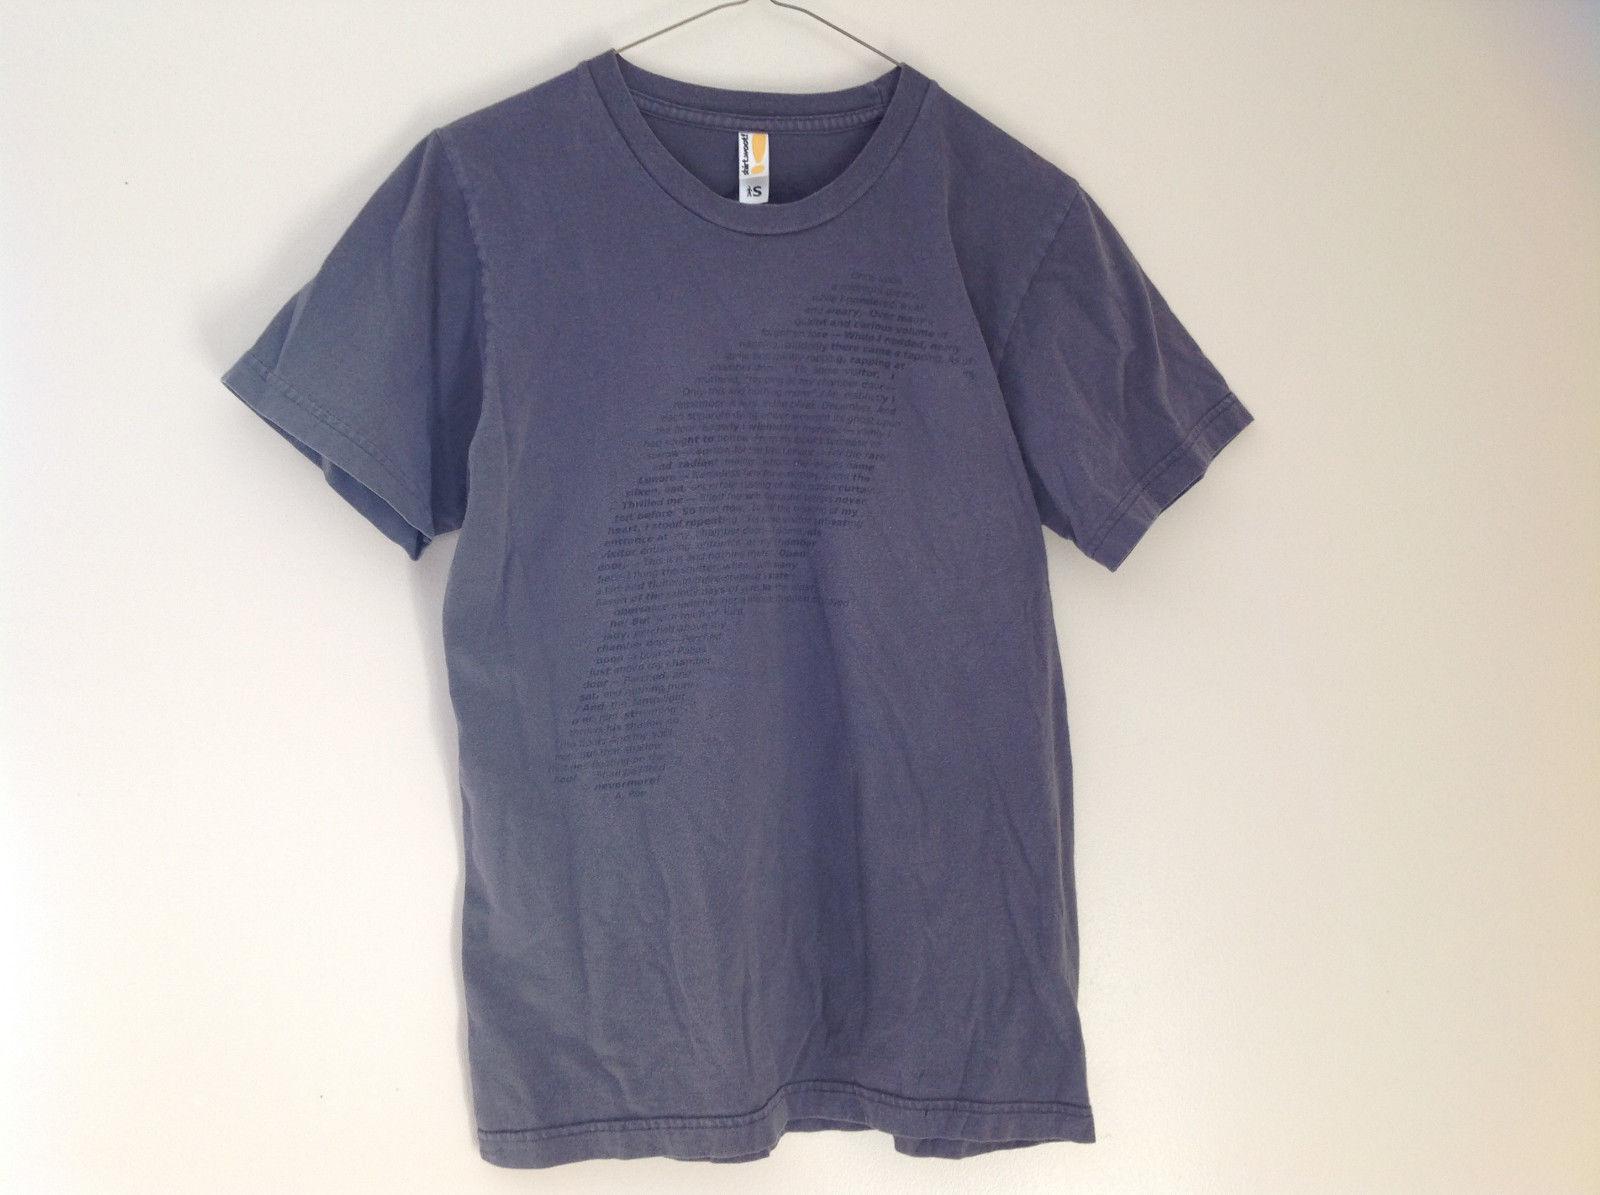 Shirt Woot Poe Raven Shape Poem Gray Short Sleeve T-Shirt Small following